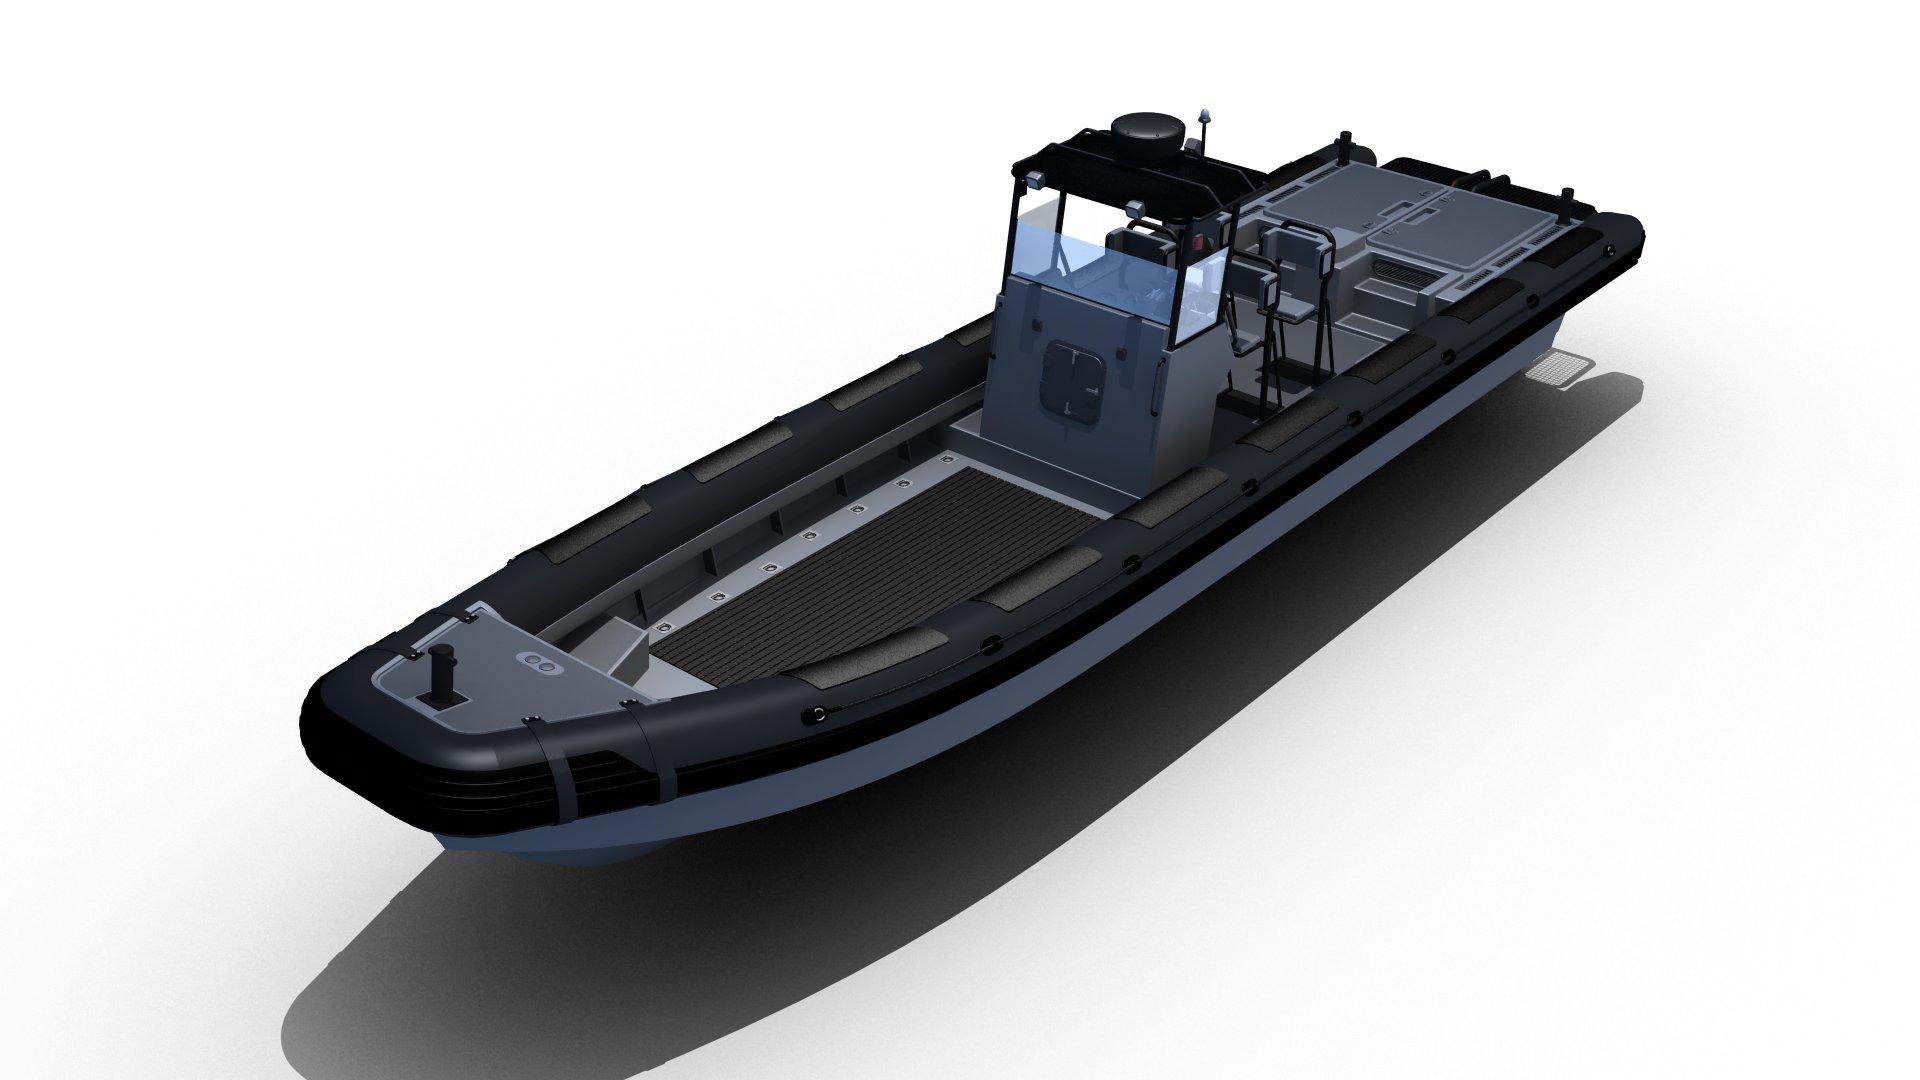 https://www.m-ribs.eu/wp-content/uploads/MRCD1250-Cargo-2x-aanzicht2-720x340.jpg